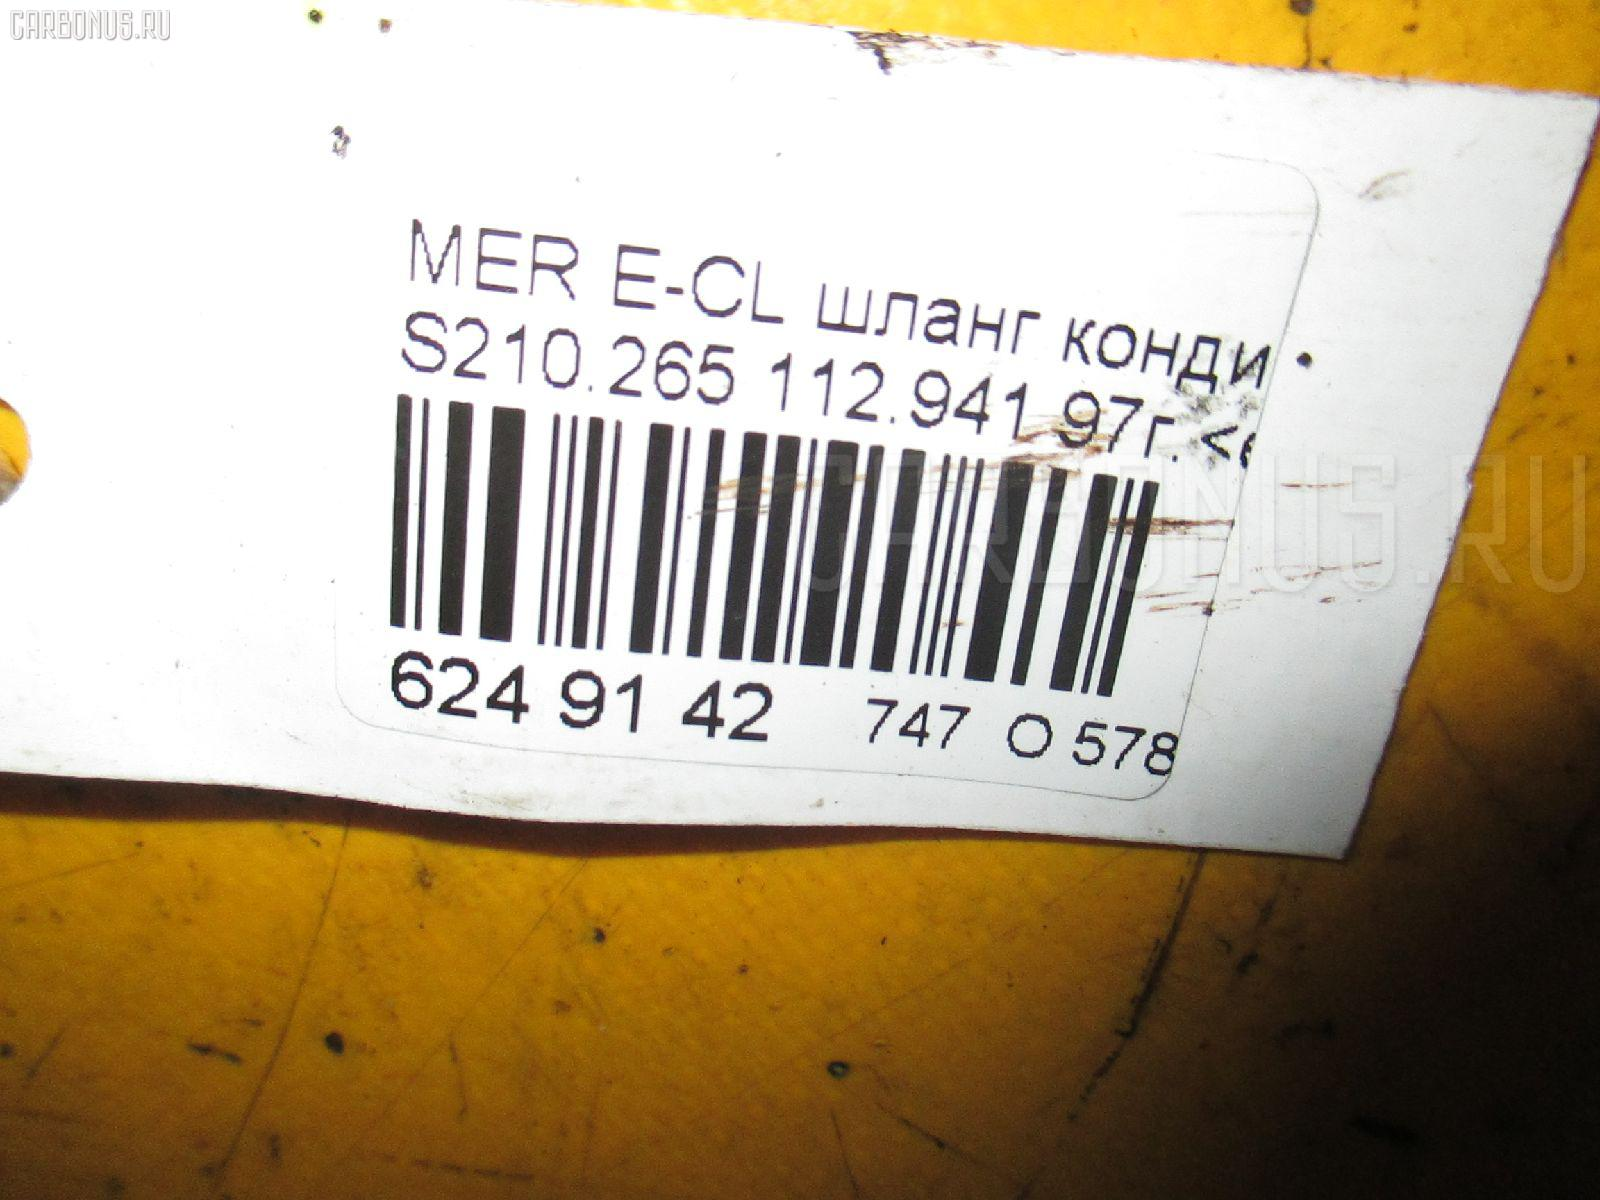 Шланг кондиционера MERCEDES-BENZ E-CLASS STATION WAGON S210.265 112.941 Фото 7